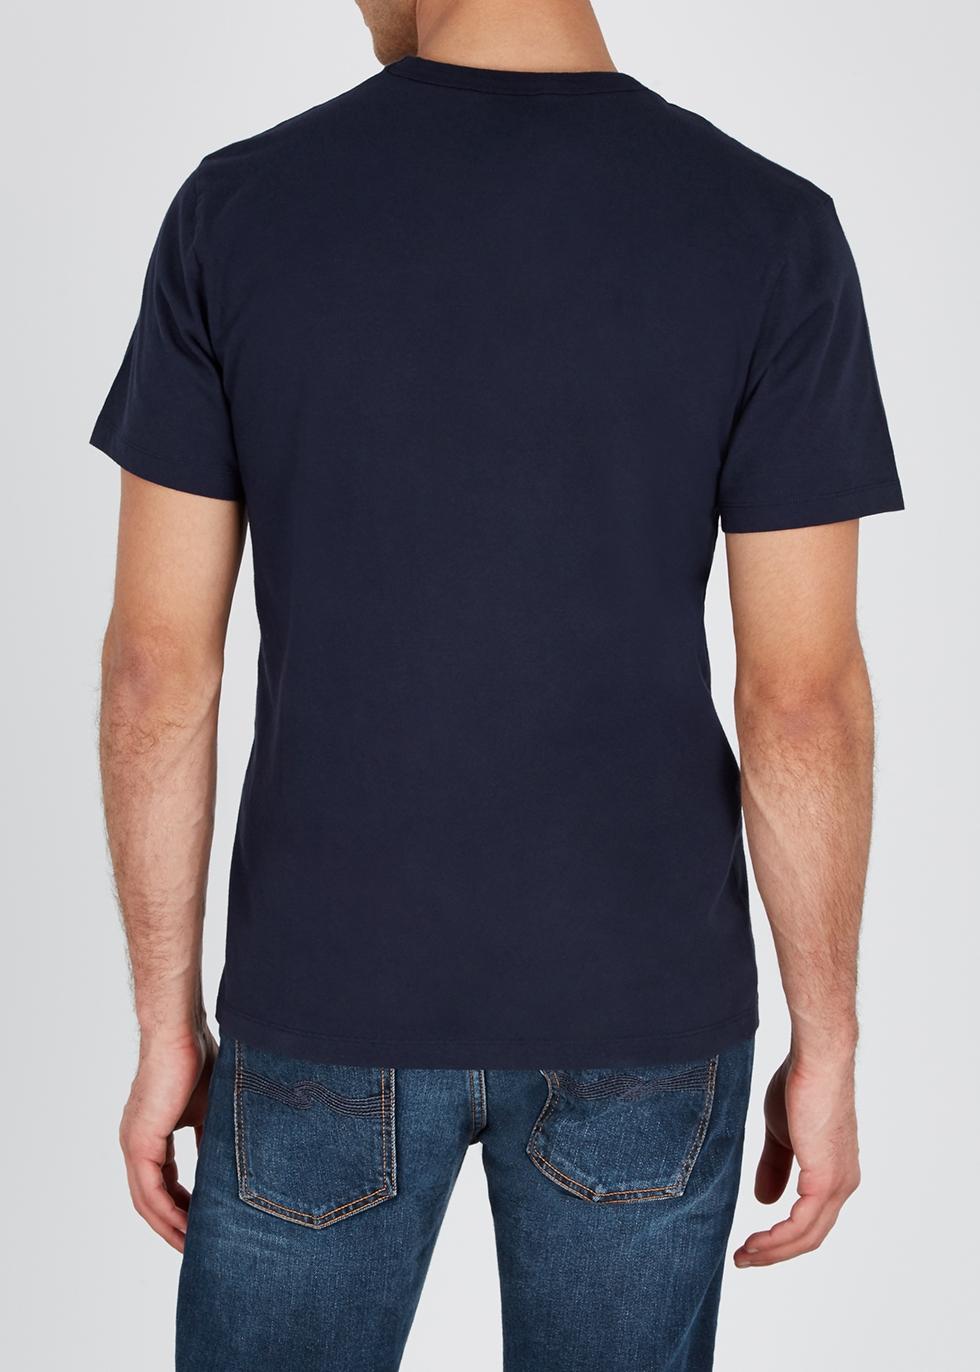 Navy printed cotton T-shirt - Maison Kitsuné